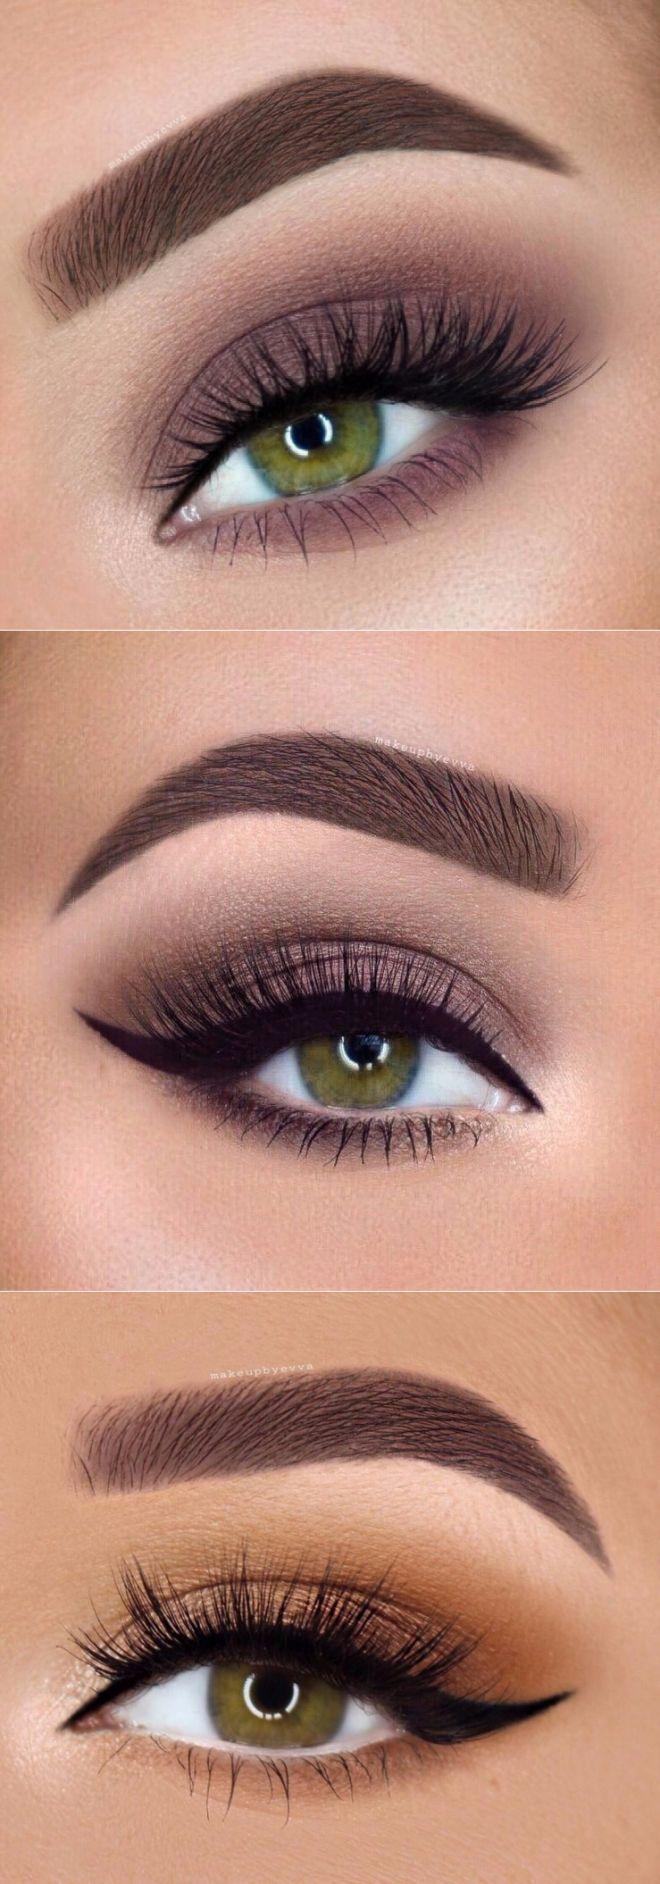 fotostrana.ru #fotostrana – Augen Make Up ♥ Parfum.de